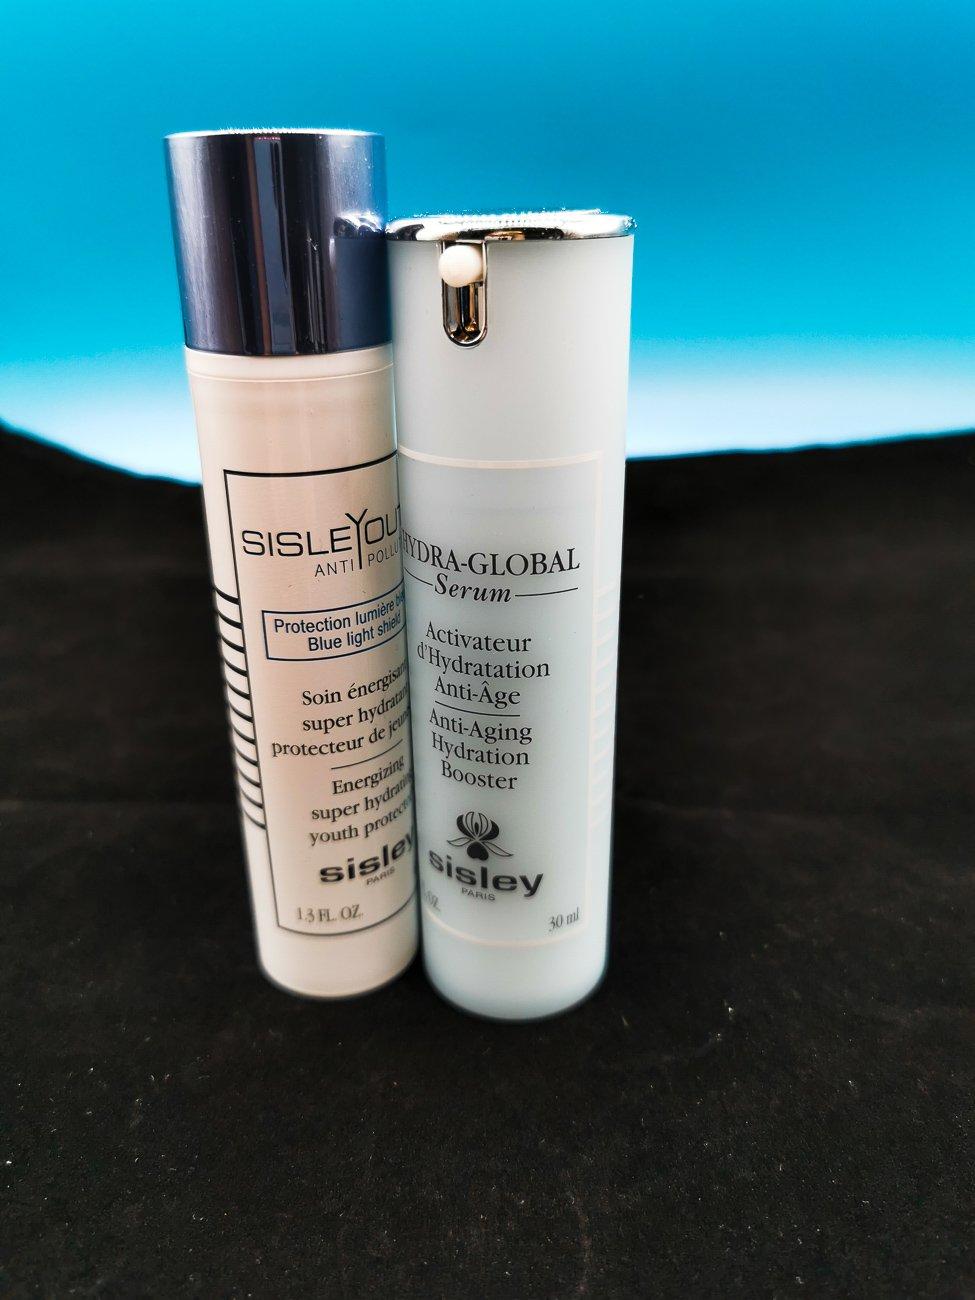 conny doll lifestyle: Journalistentraining Hautpflege, Kosmetik, anti aging, sisley, feuchtigkeitspflege, blaulichtfilter